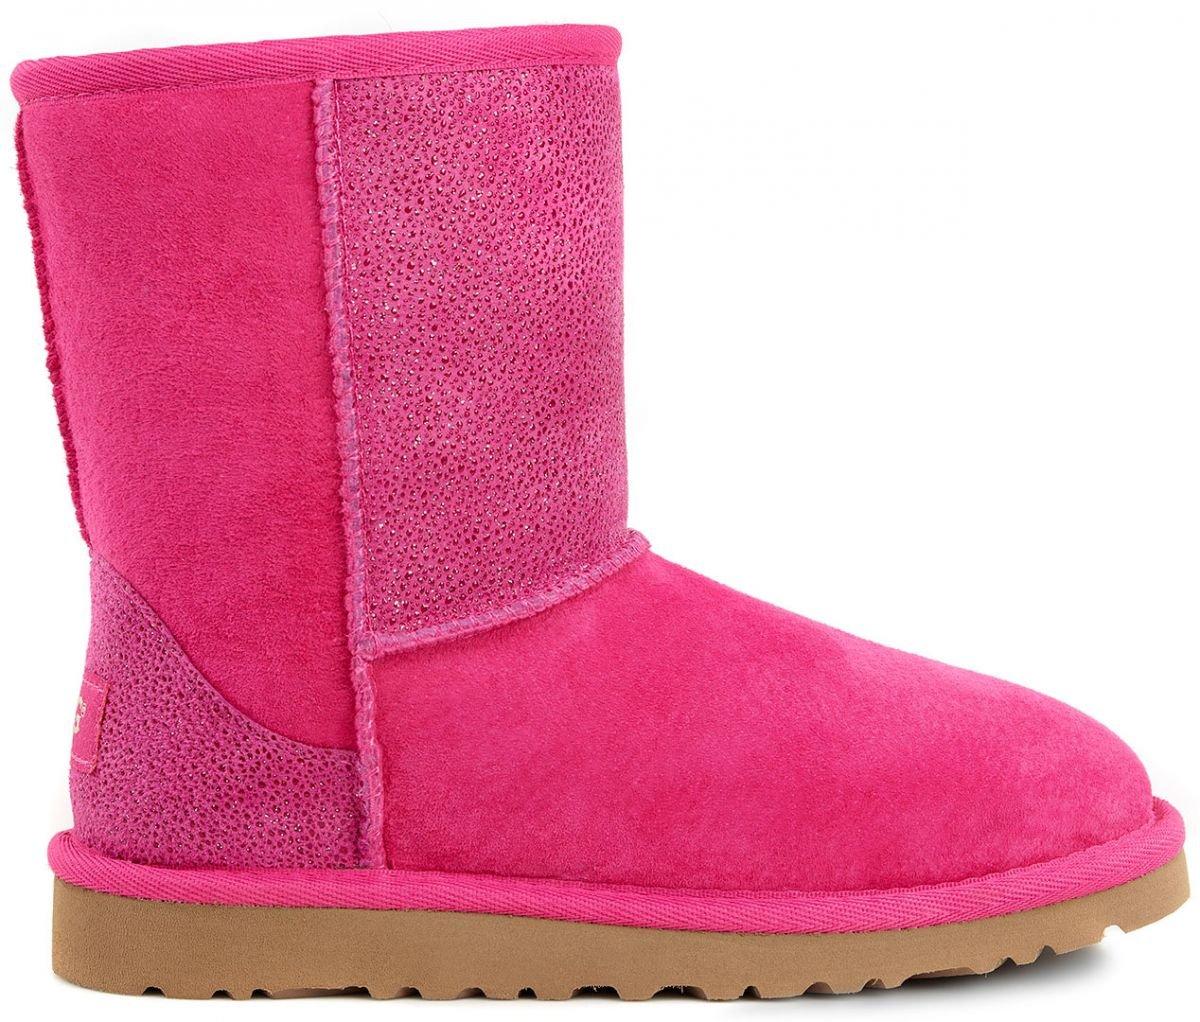 UGG Kids Classic Short Serein Boot Diva Pink Size 3 M US Little Kid